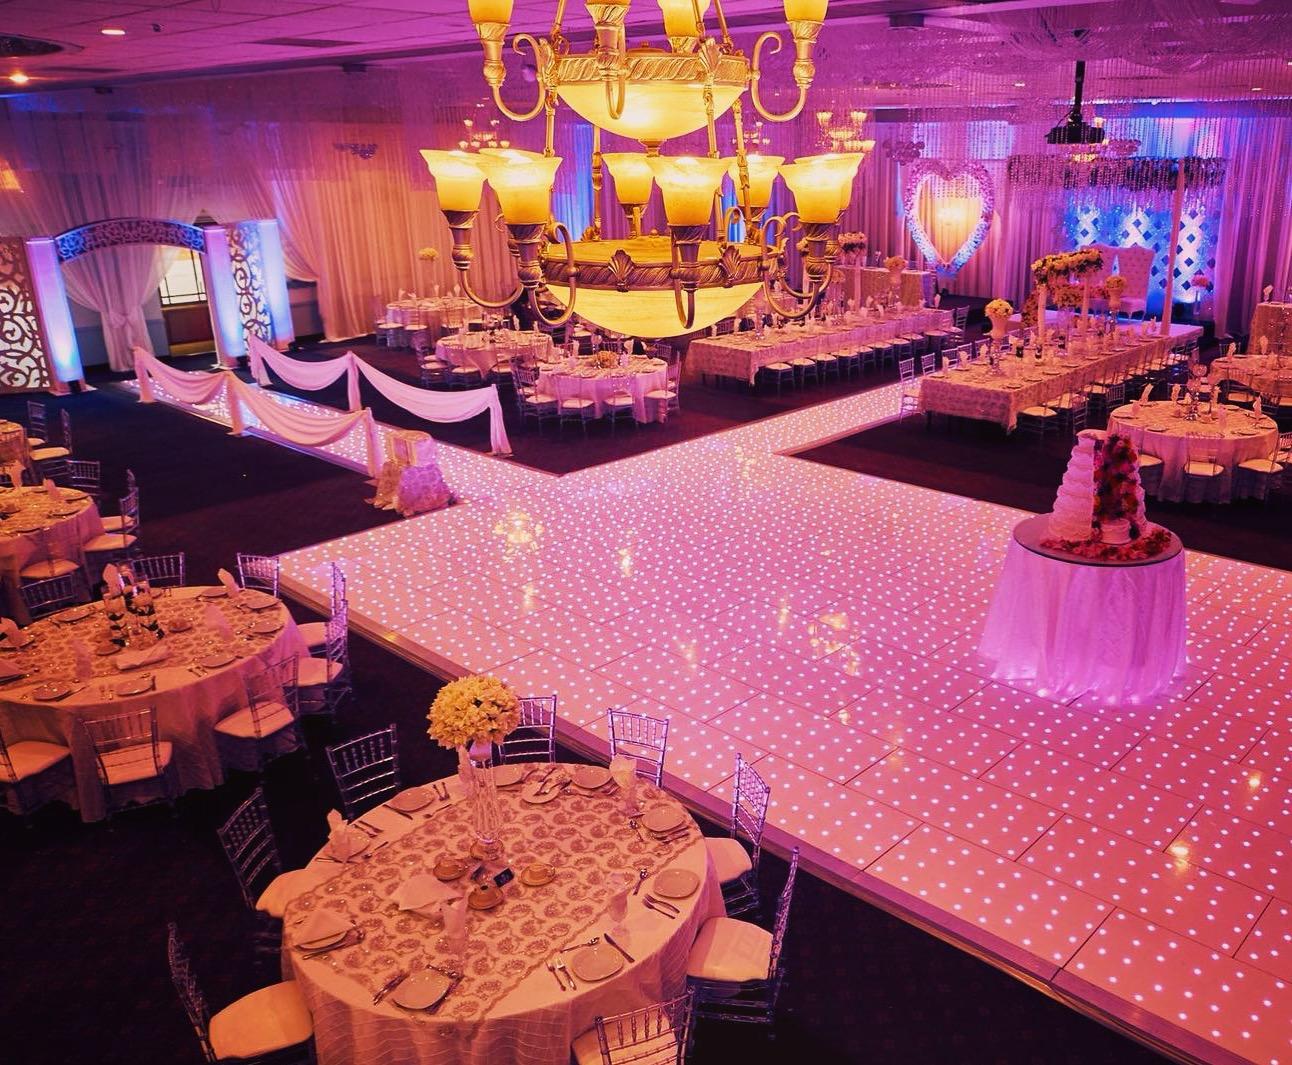 LED Starlit Dance Floor for wedding events